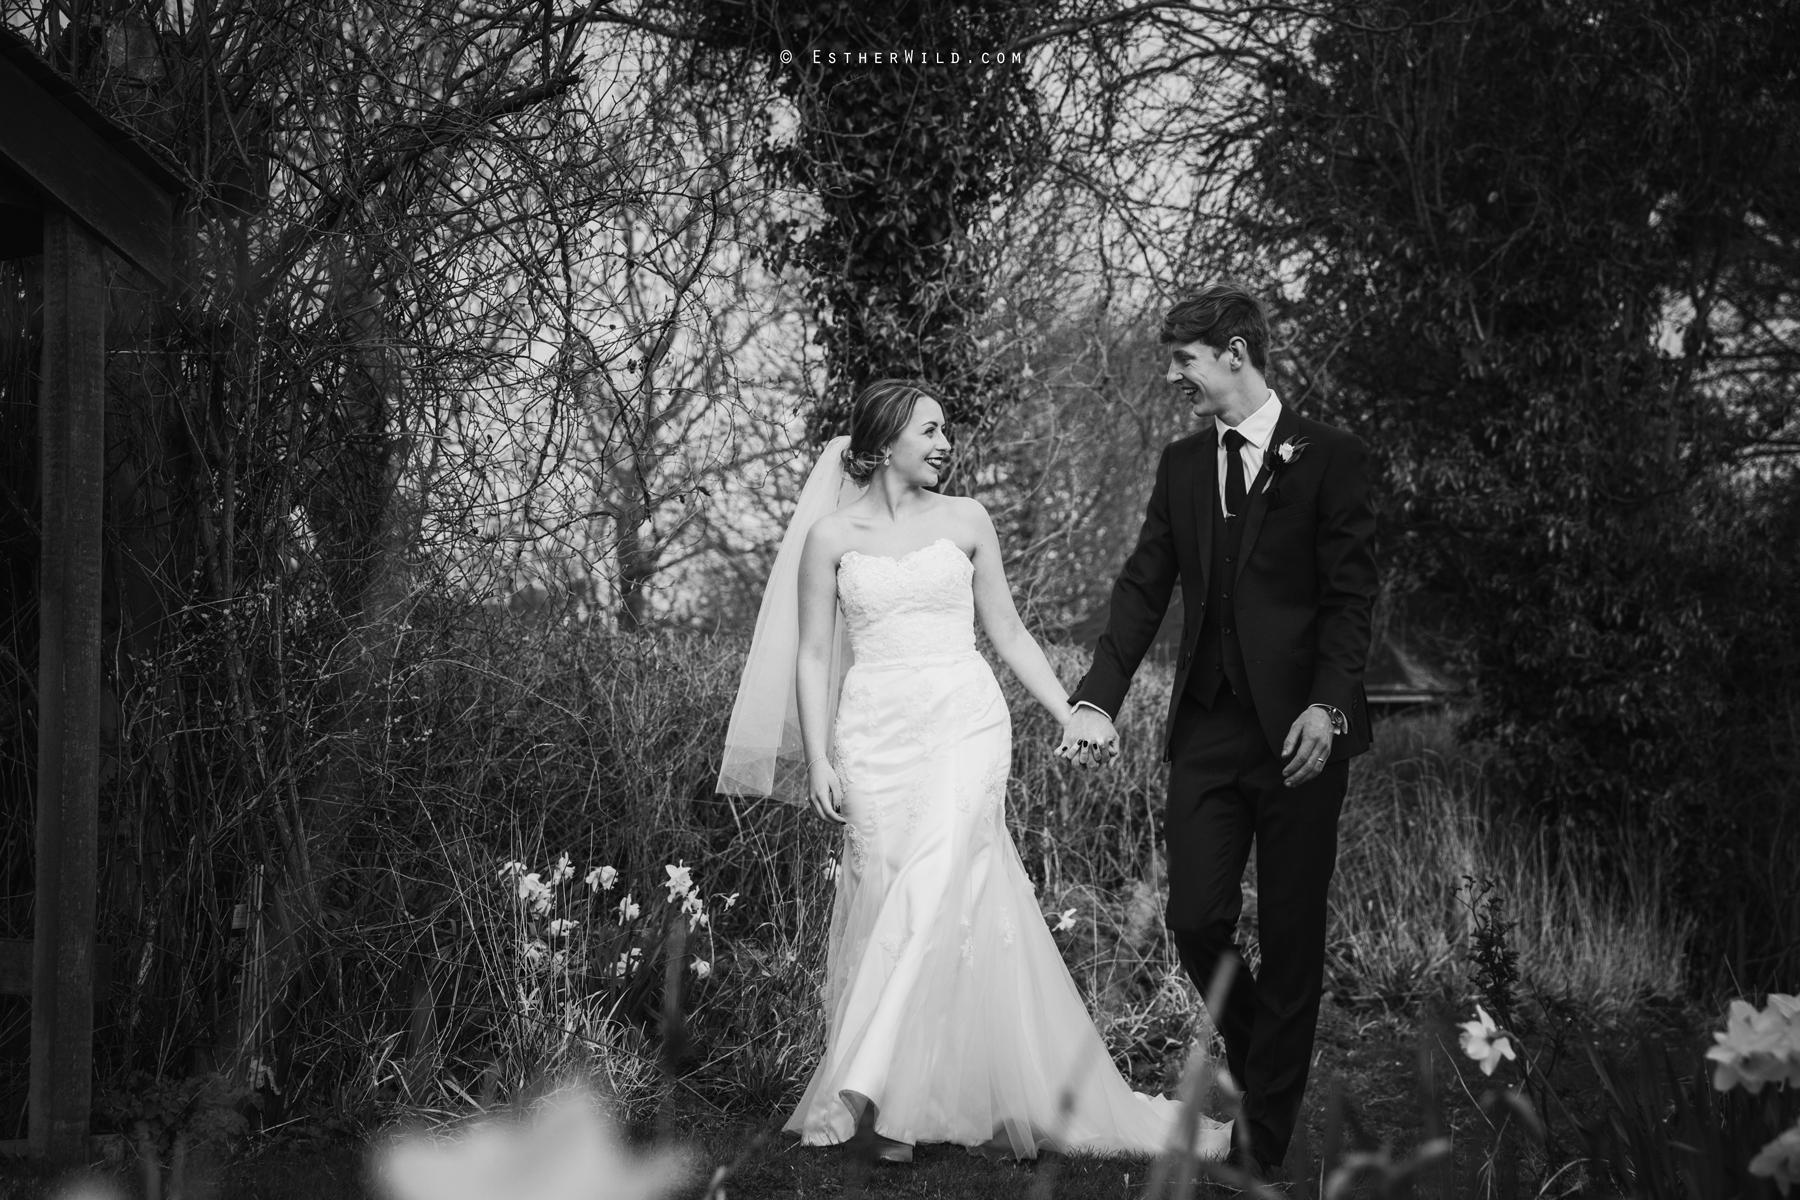 Glebe_Farm_Barn_Rustic_Norfolk_Wedding_Esther_Wild_Photographer_Copyright_IMG_1649-1.jpg